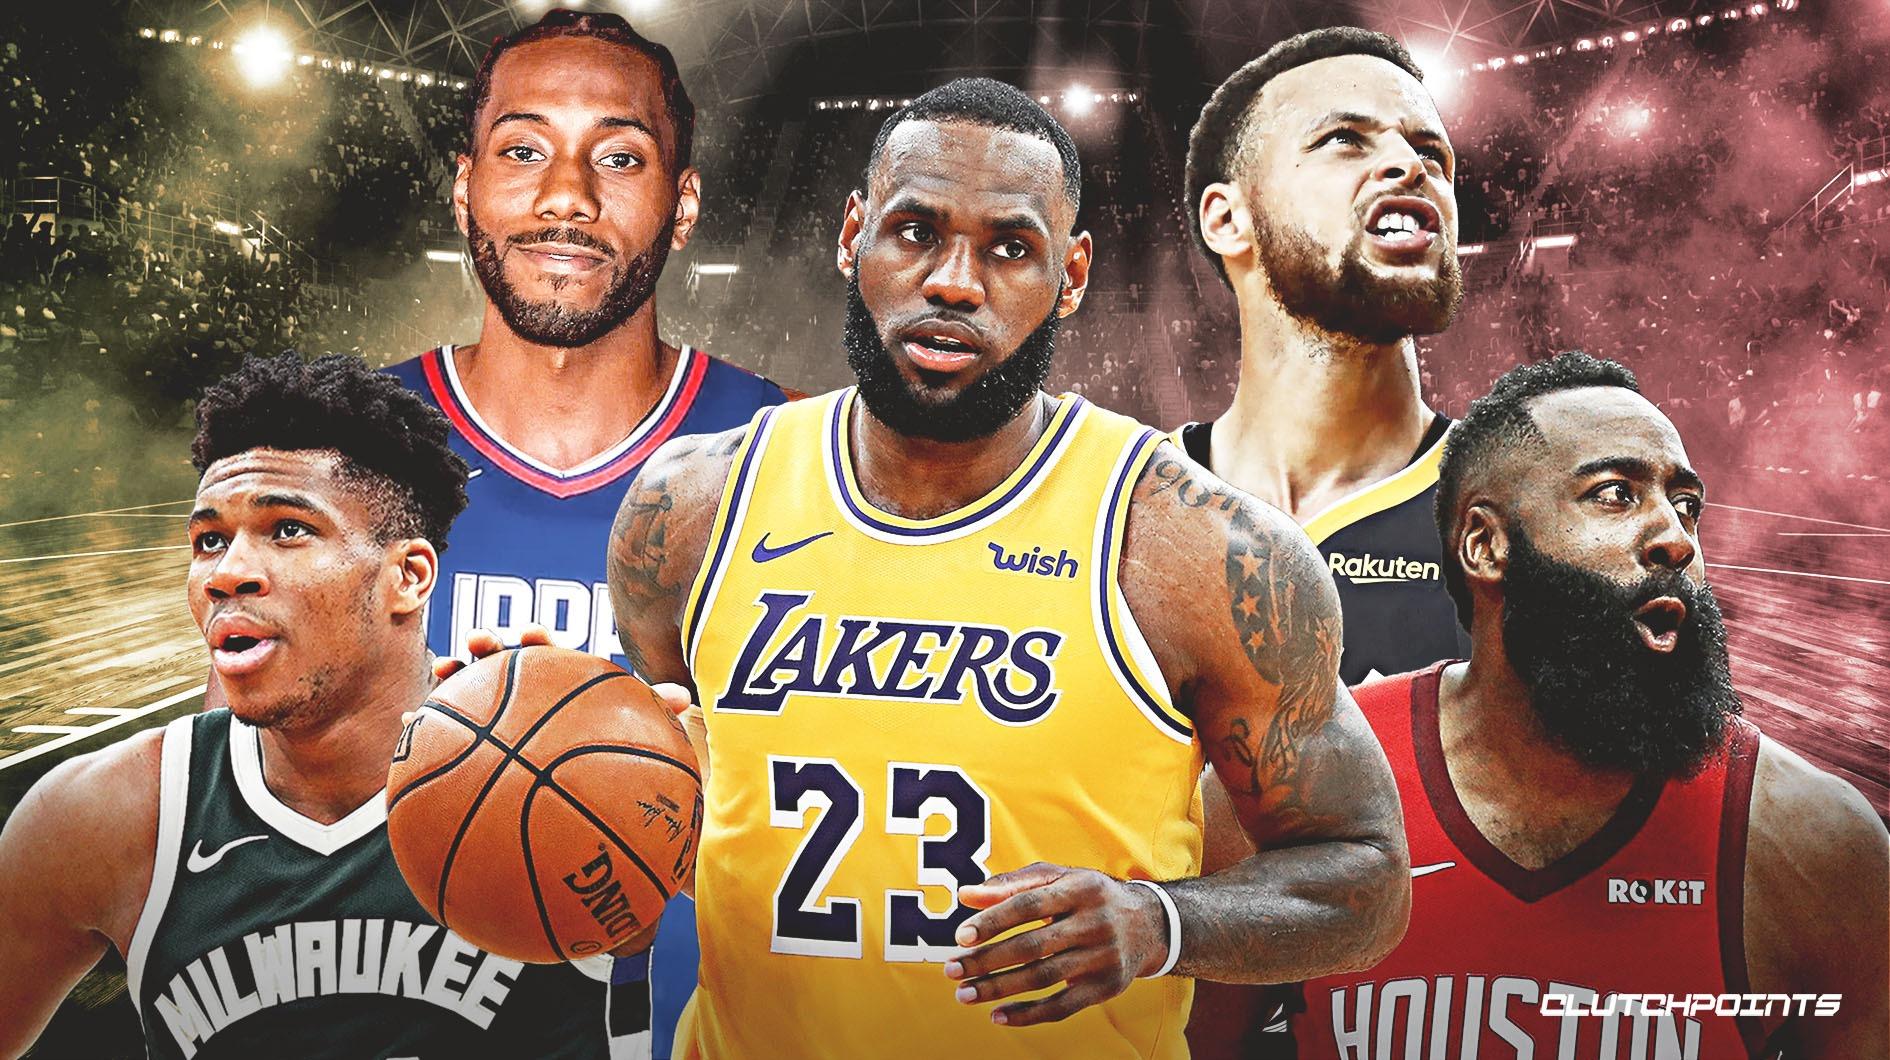 احتمال تعطیلی دوباره لیگ بسکتبال NBA